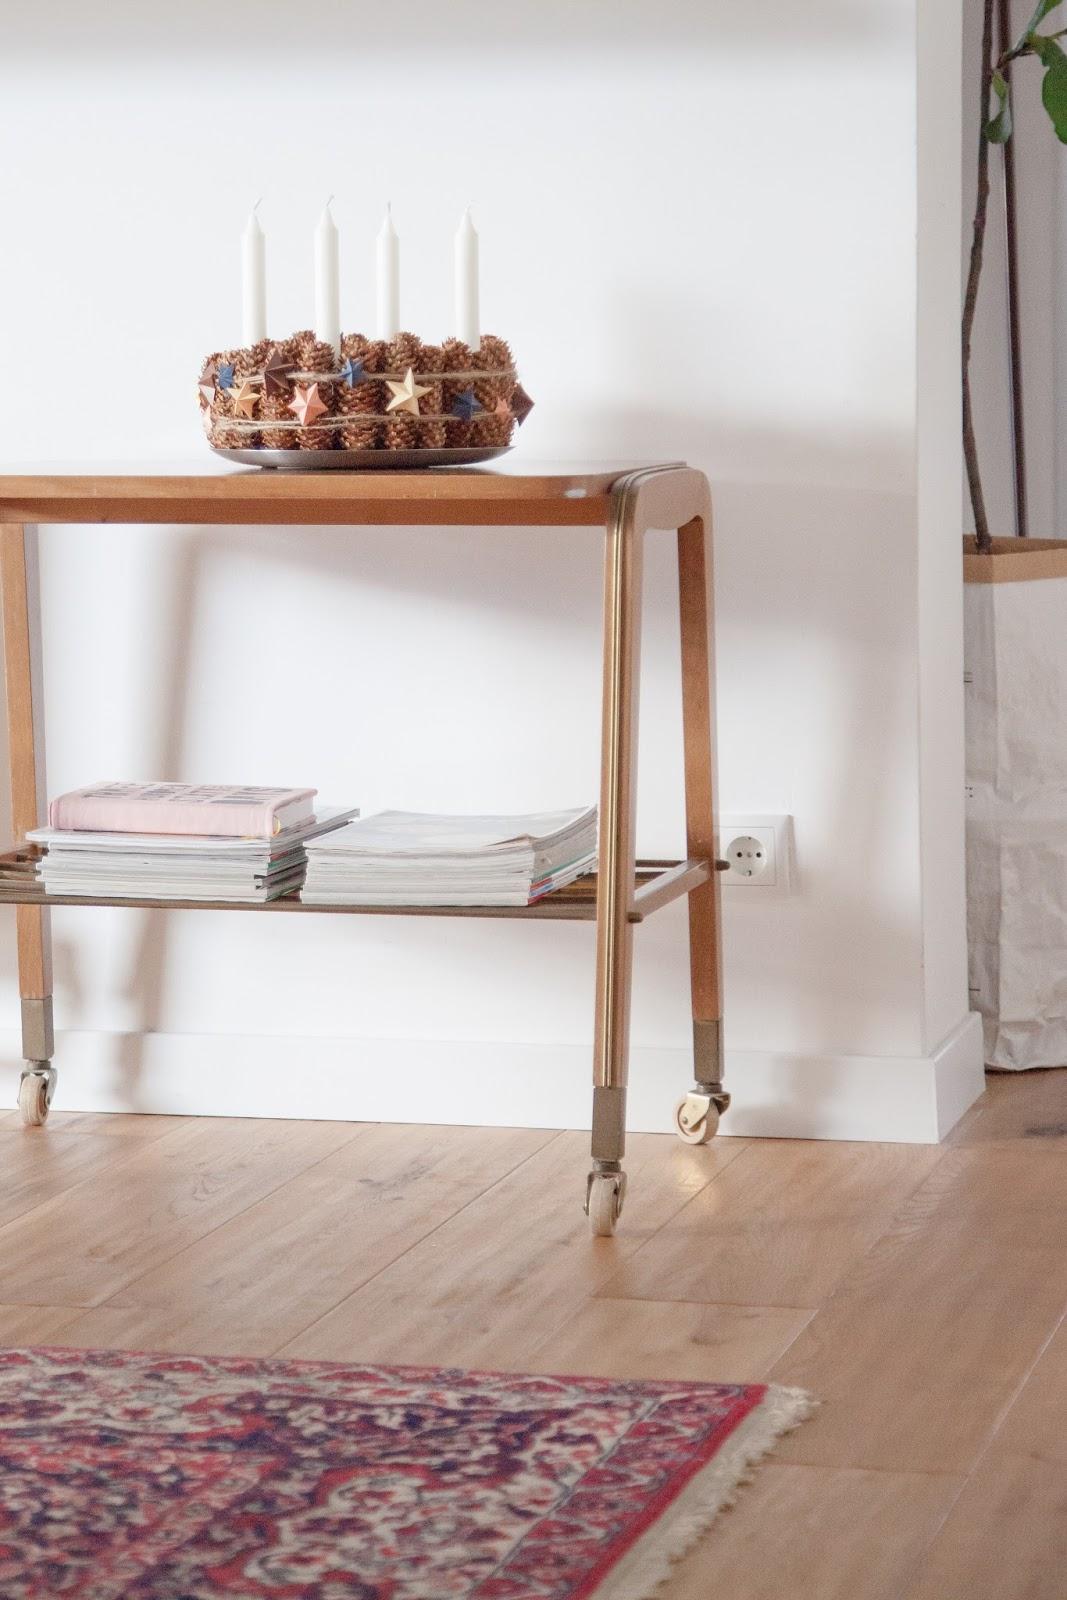 wohn projekt der mama tochter blog f r interior diy dekoration und kreatives. Black Bedroom Furniture Sets. Home Design Ideas